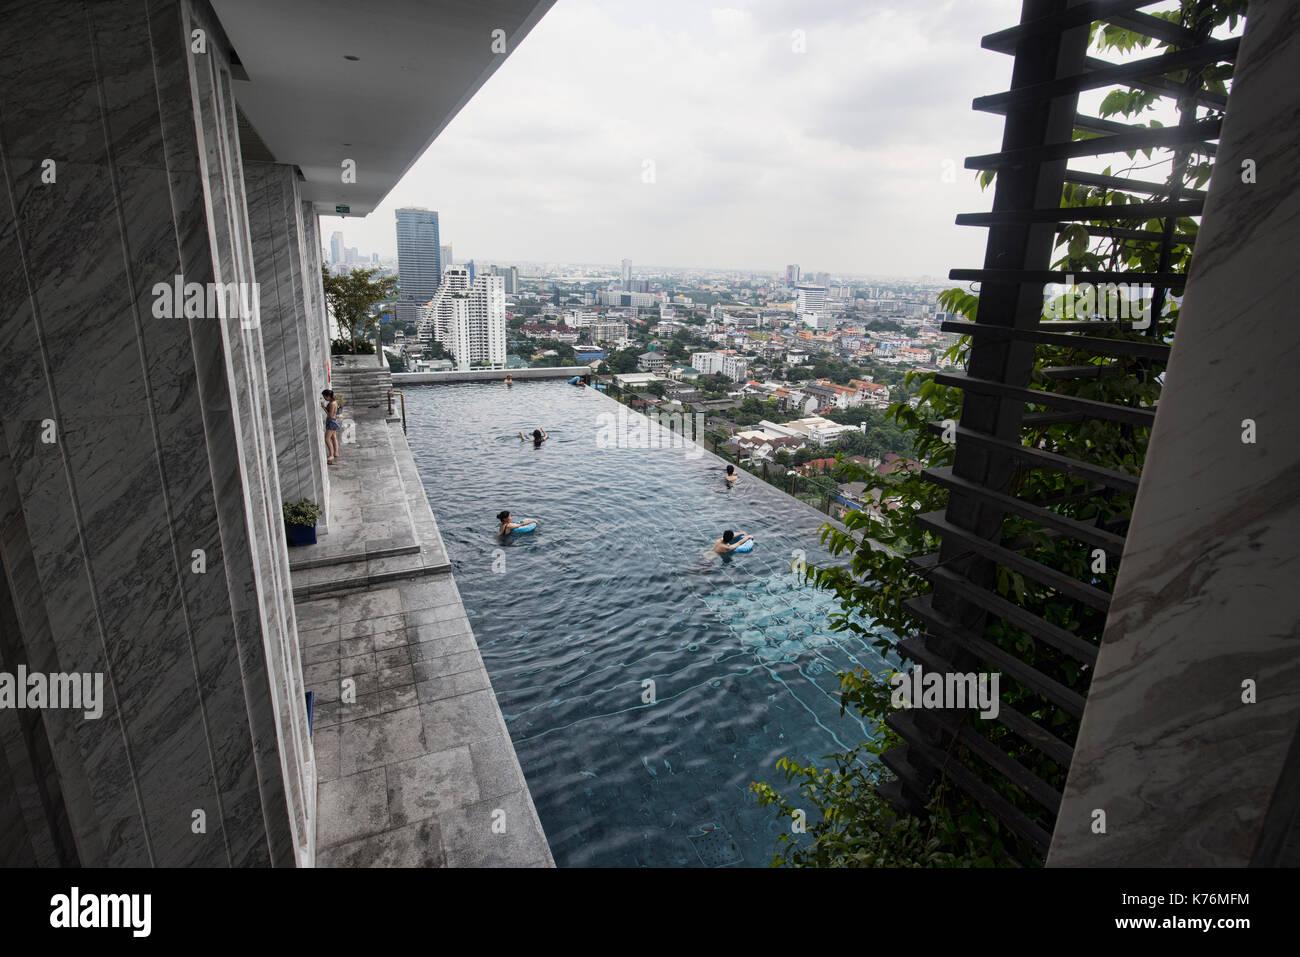 Infinity edge swimming pool, Bangkok, Thailand Stock Photo ...